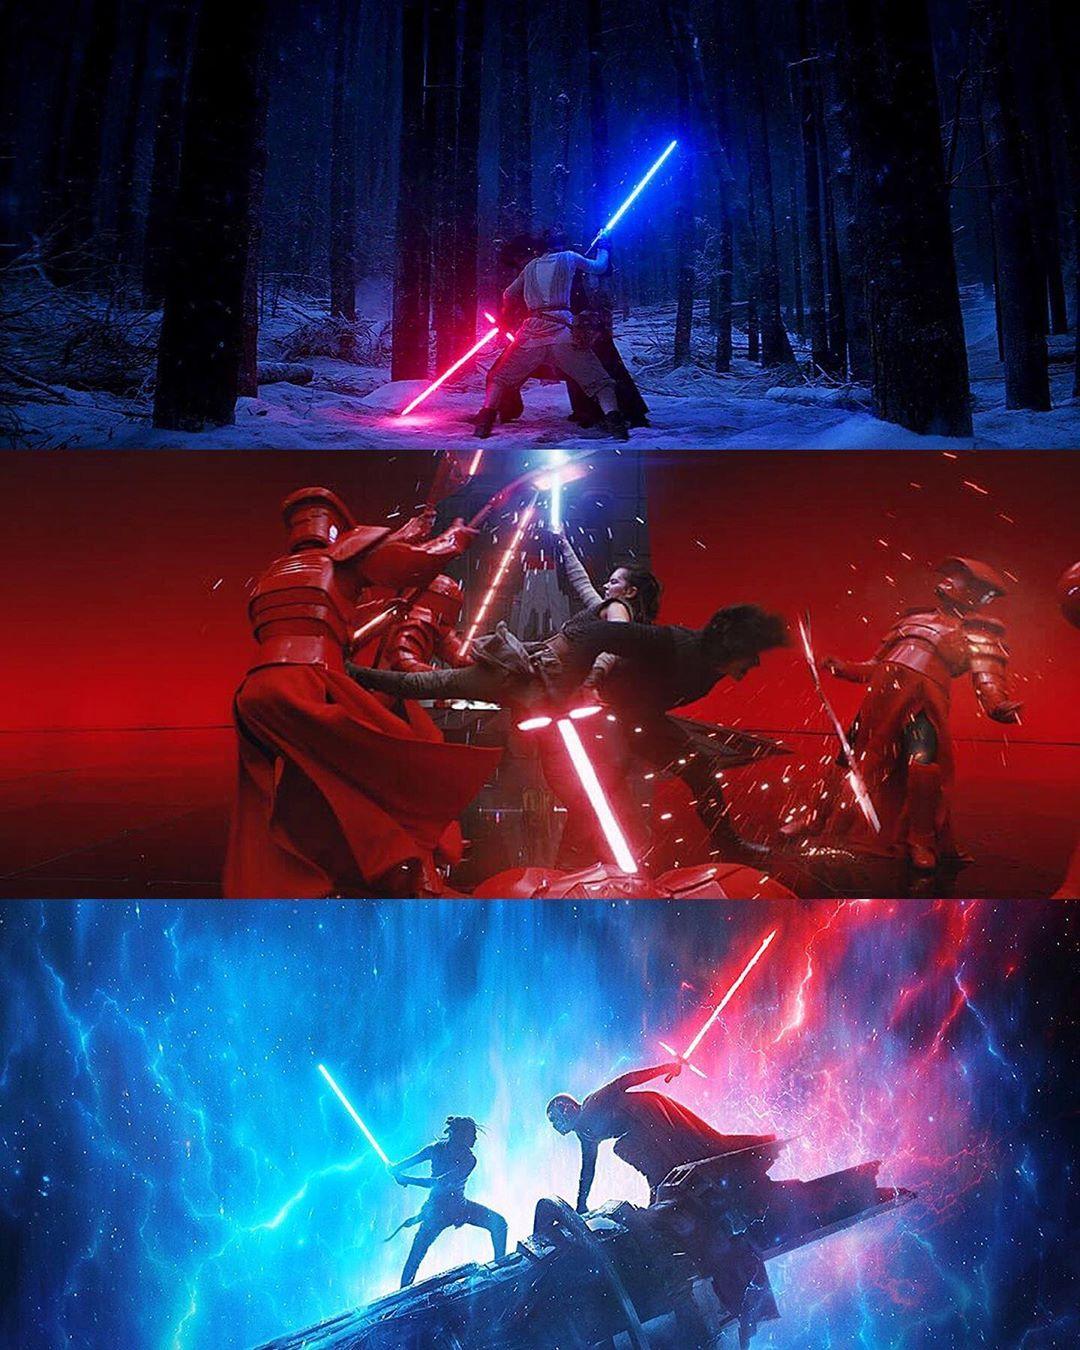 The Star Wars Sequel Trilogy Starwars Theriseofskywalker Tros Theforceawakens Star Wars Background Star Wars Sequel Trilogy Star Wars Poster